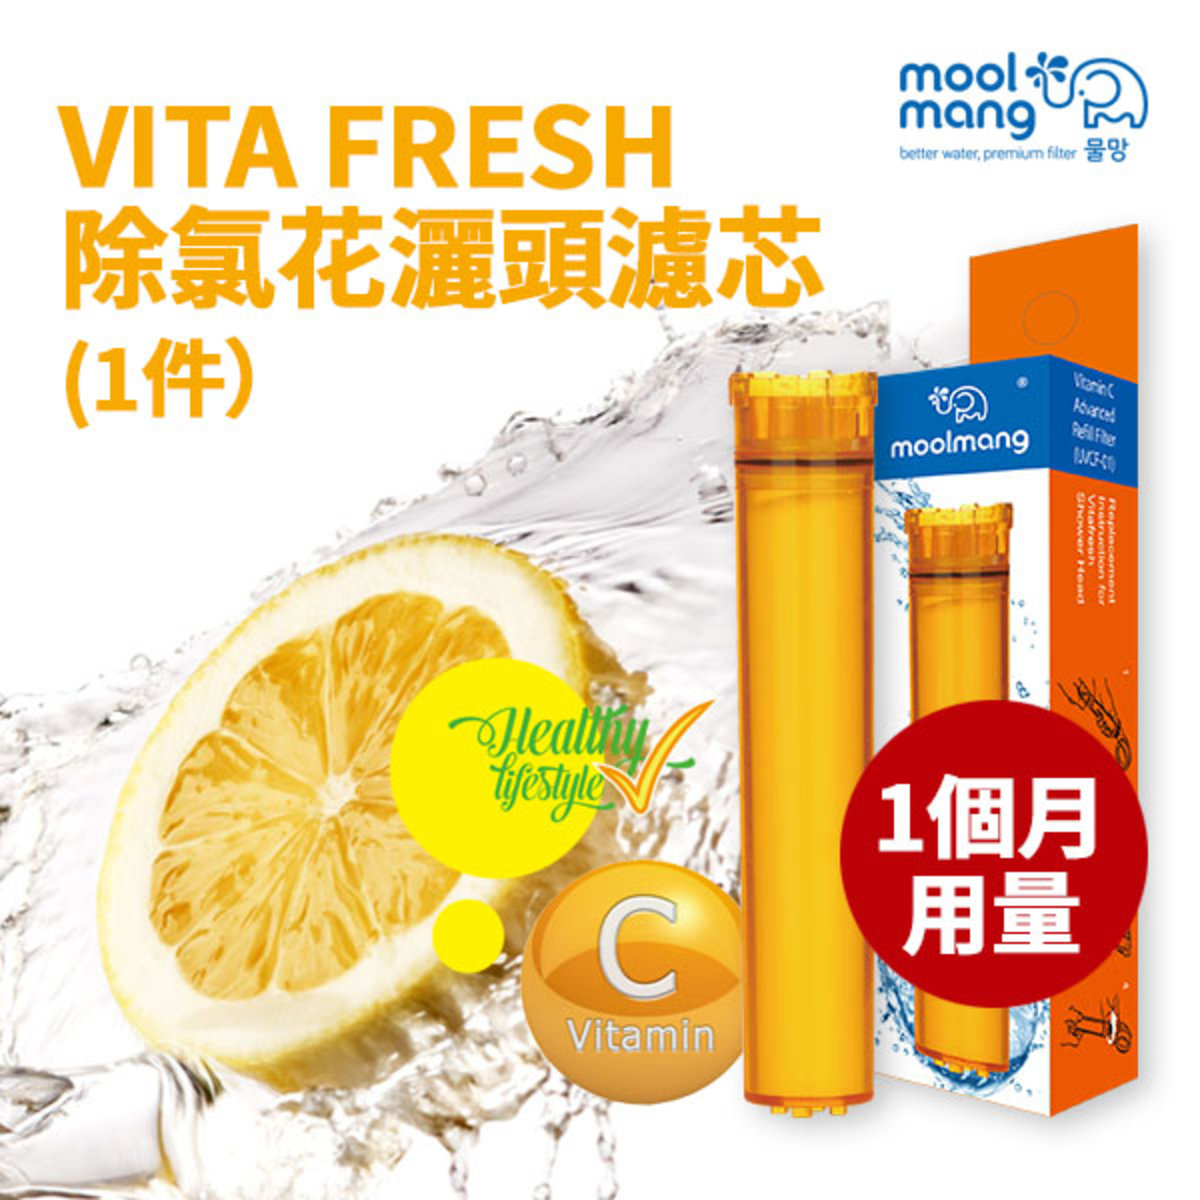 Vitafresh Filter Catridge